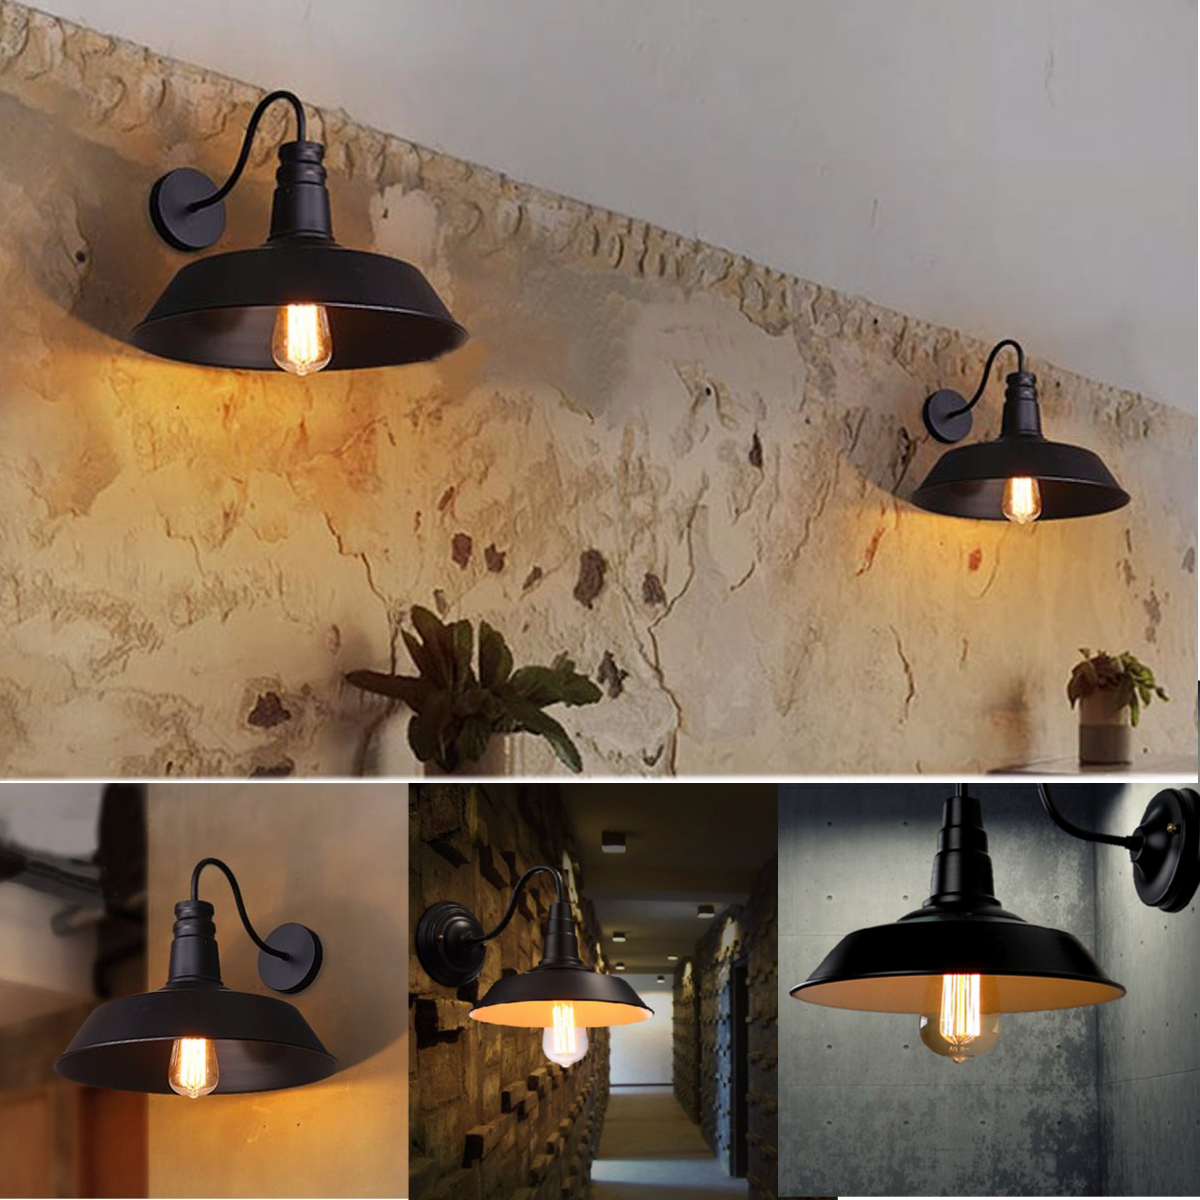 Vintage Retro Iron Industrial Edison Loft Rustic Wall Sconce Gooseneck Light Lamp Metal... by